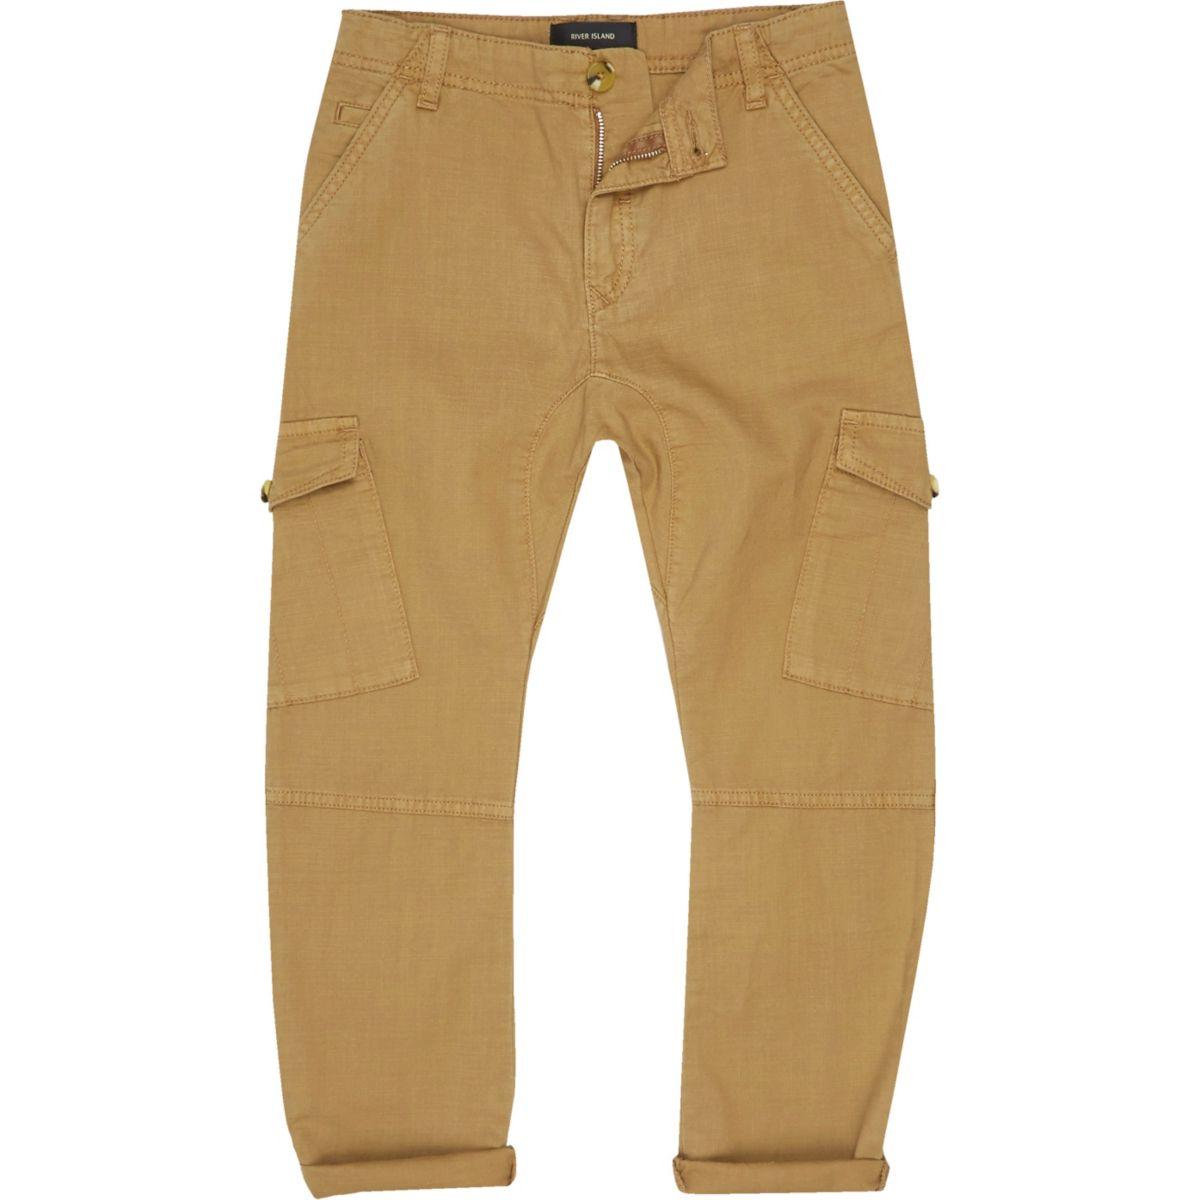 Boys light brown cargo pants